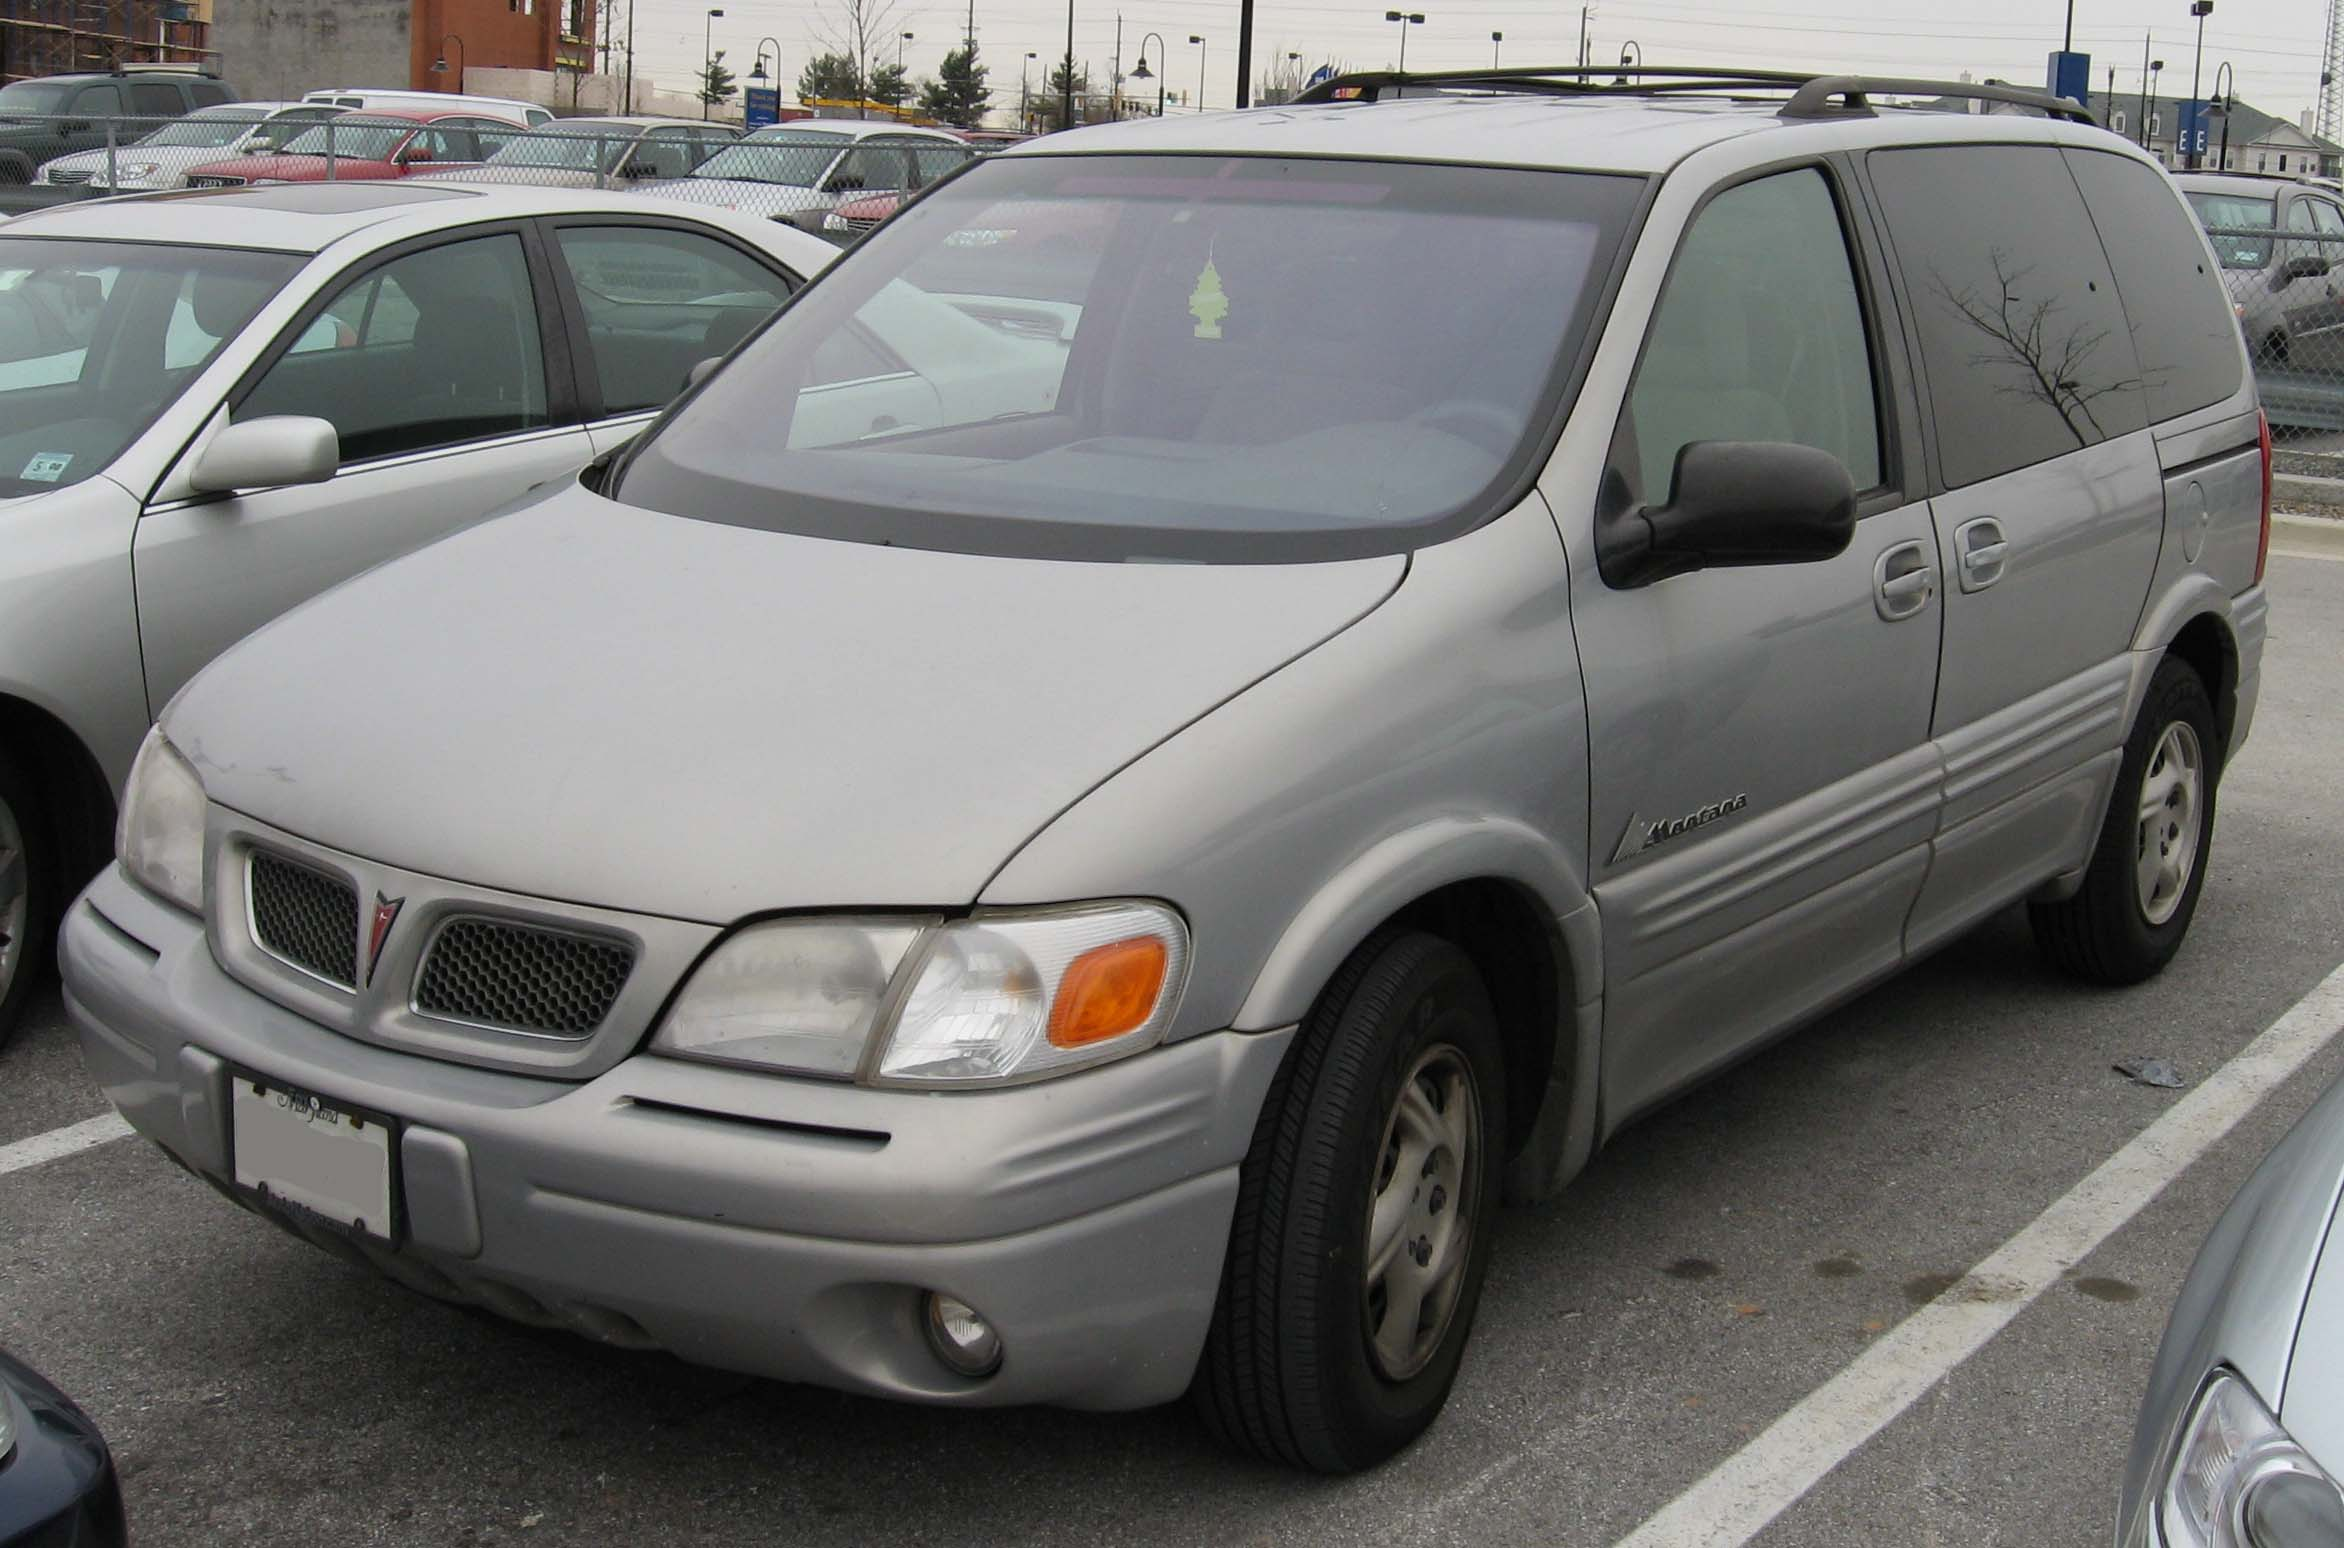 Pontiac Montana I 1997 - 2005 Minivan #3